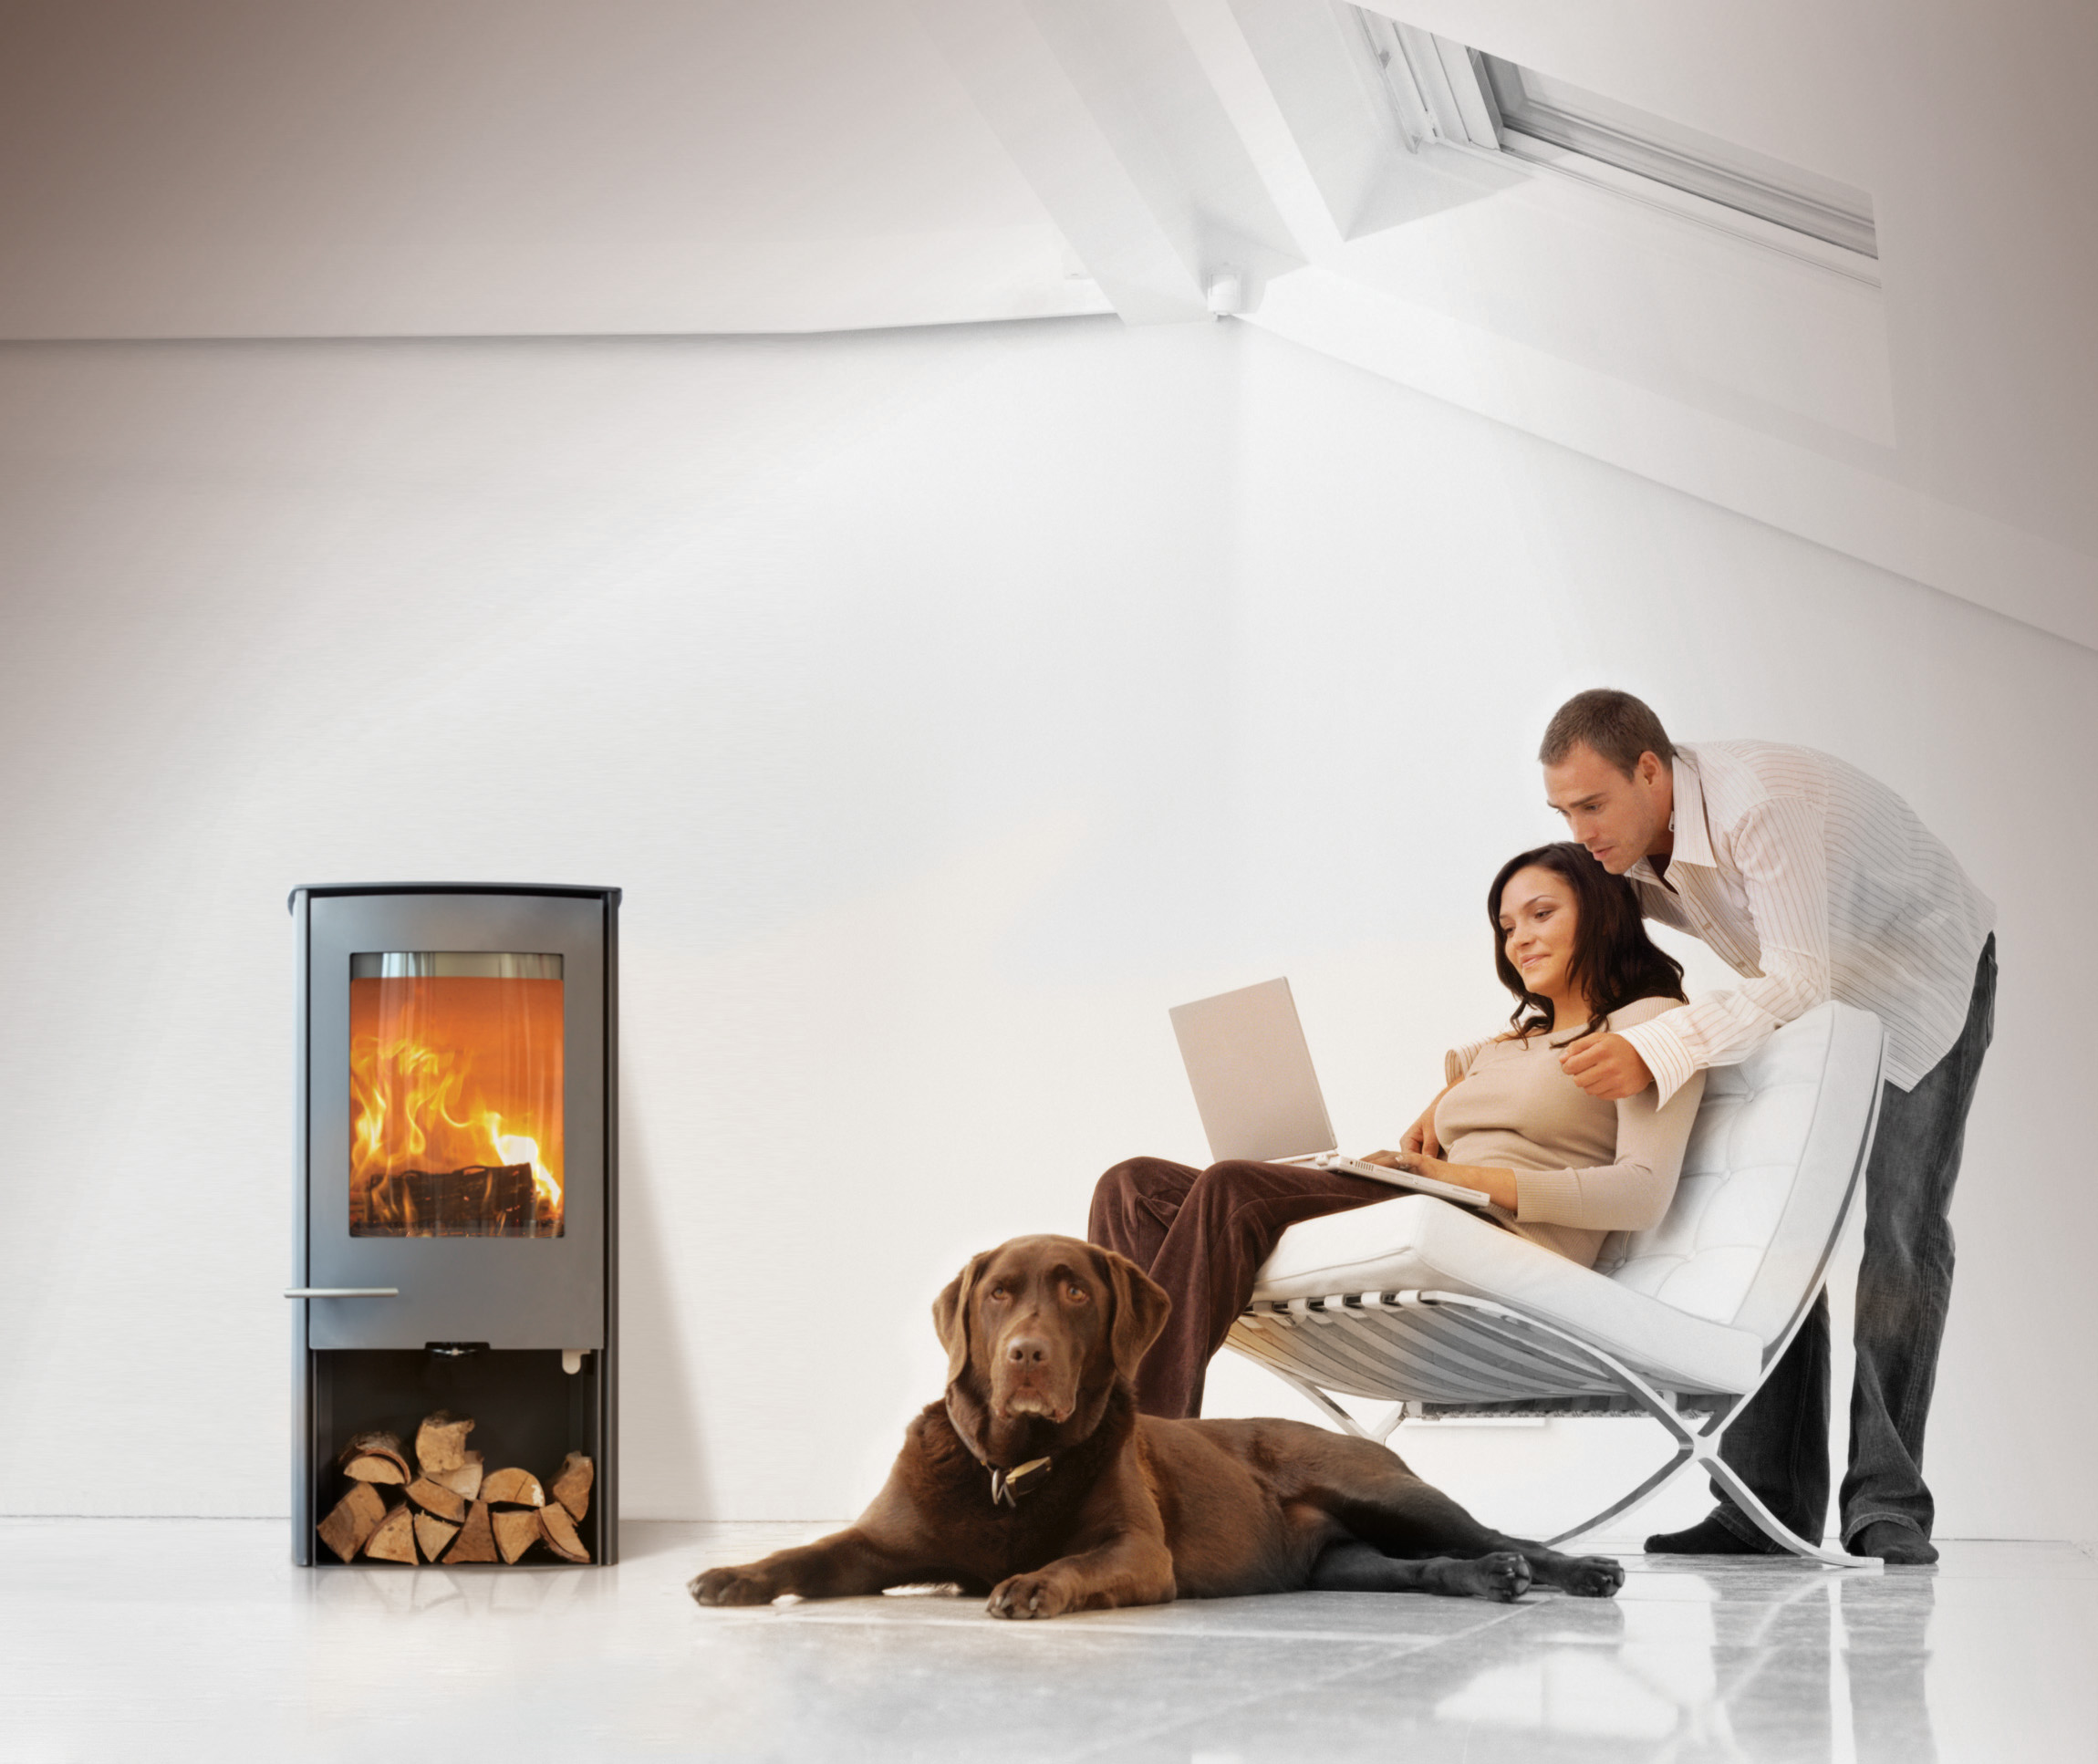 lotus mondo 2 fra pejsebutikken pejsebutikken. Black Bedroom Furniture Sets. Home Design Ideas